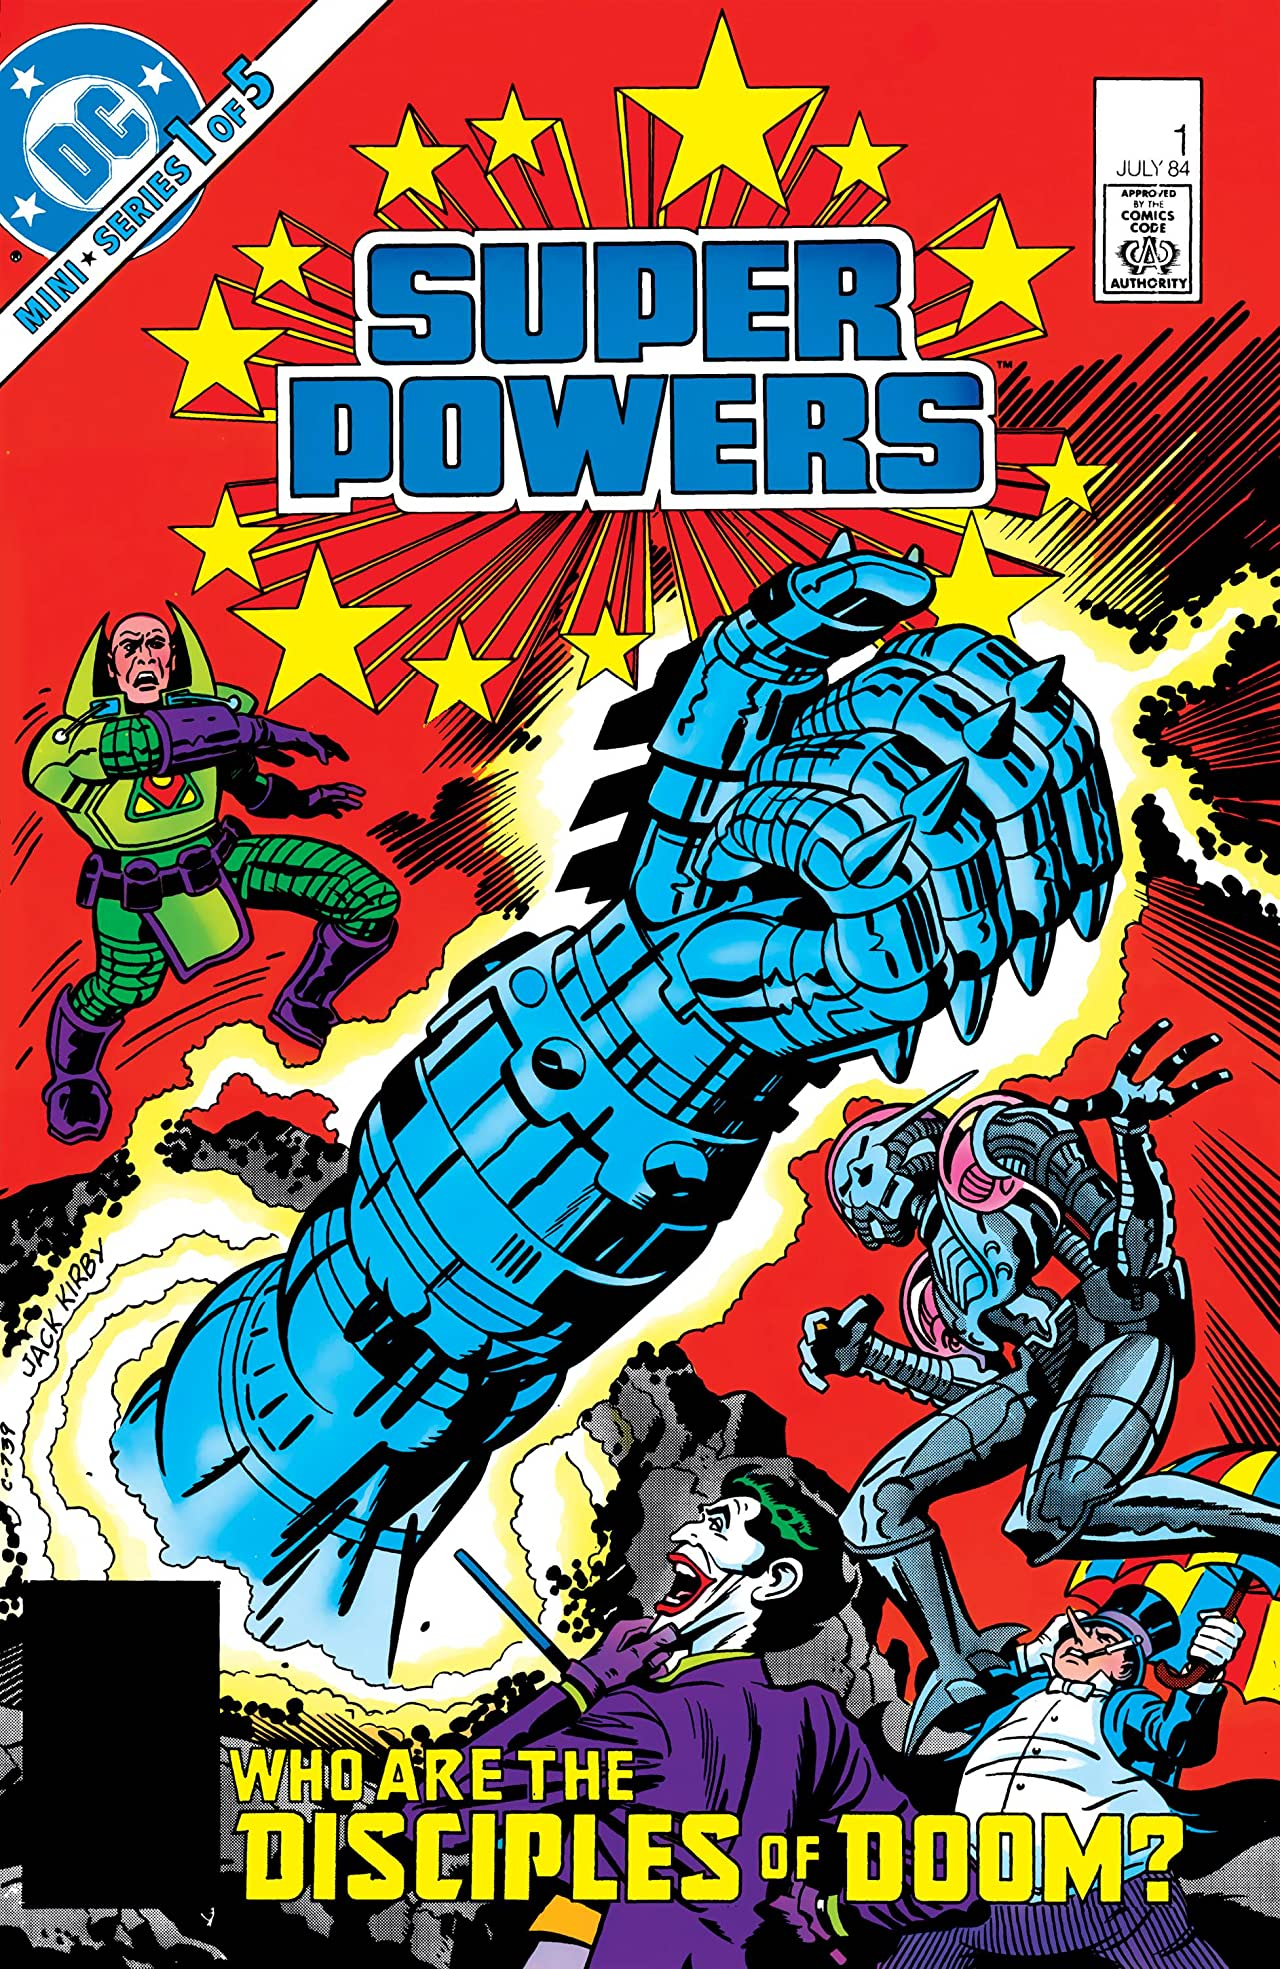 Super Powers (1984) #1